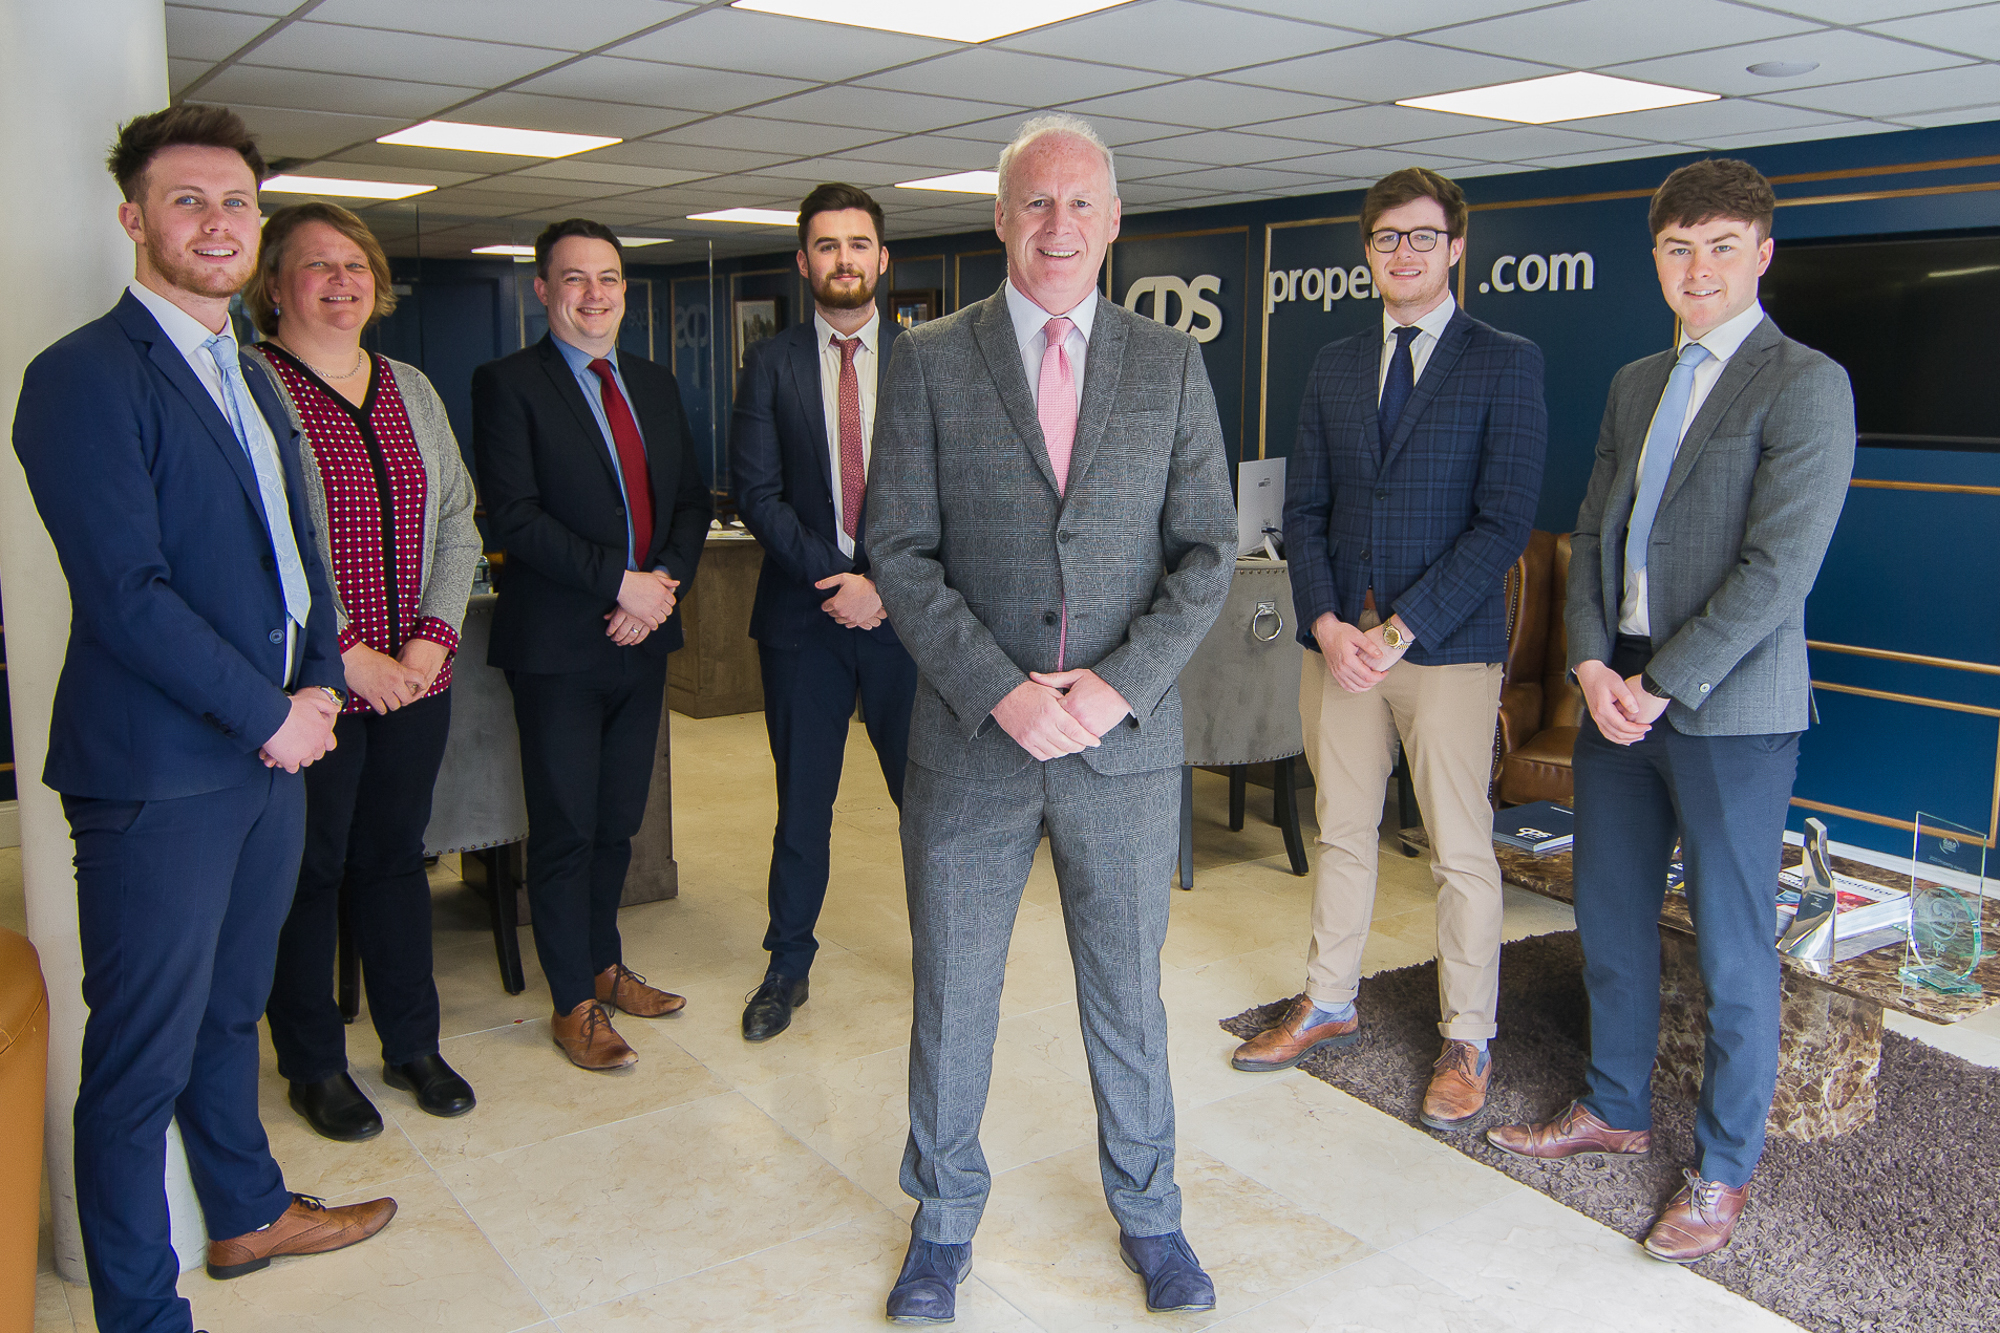 Art O'Hagan and team at CPS Property in Northern Ireland